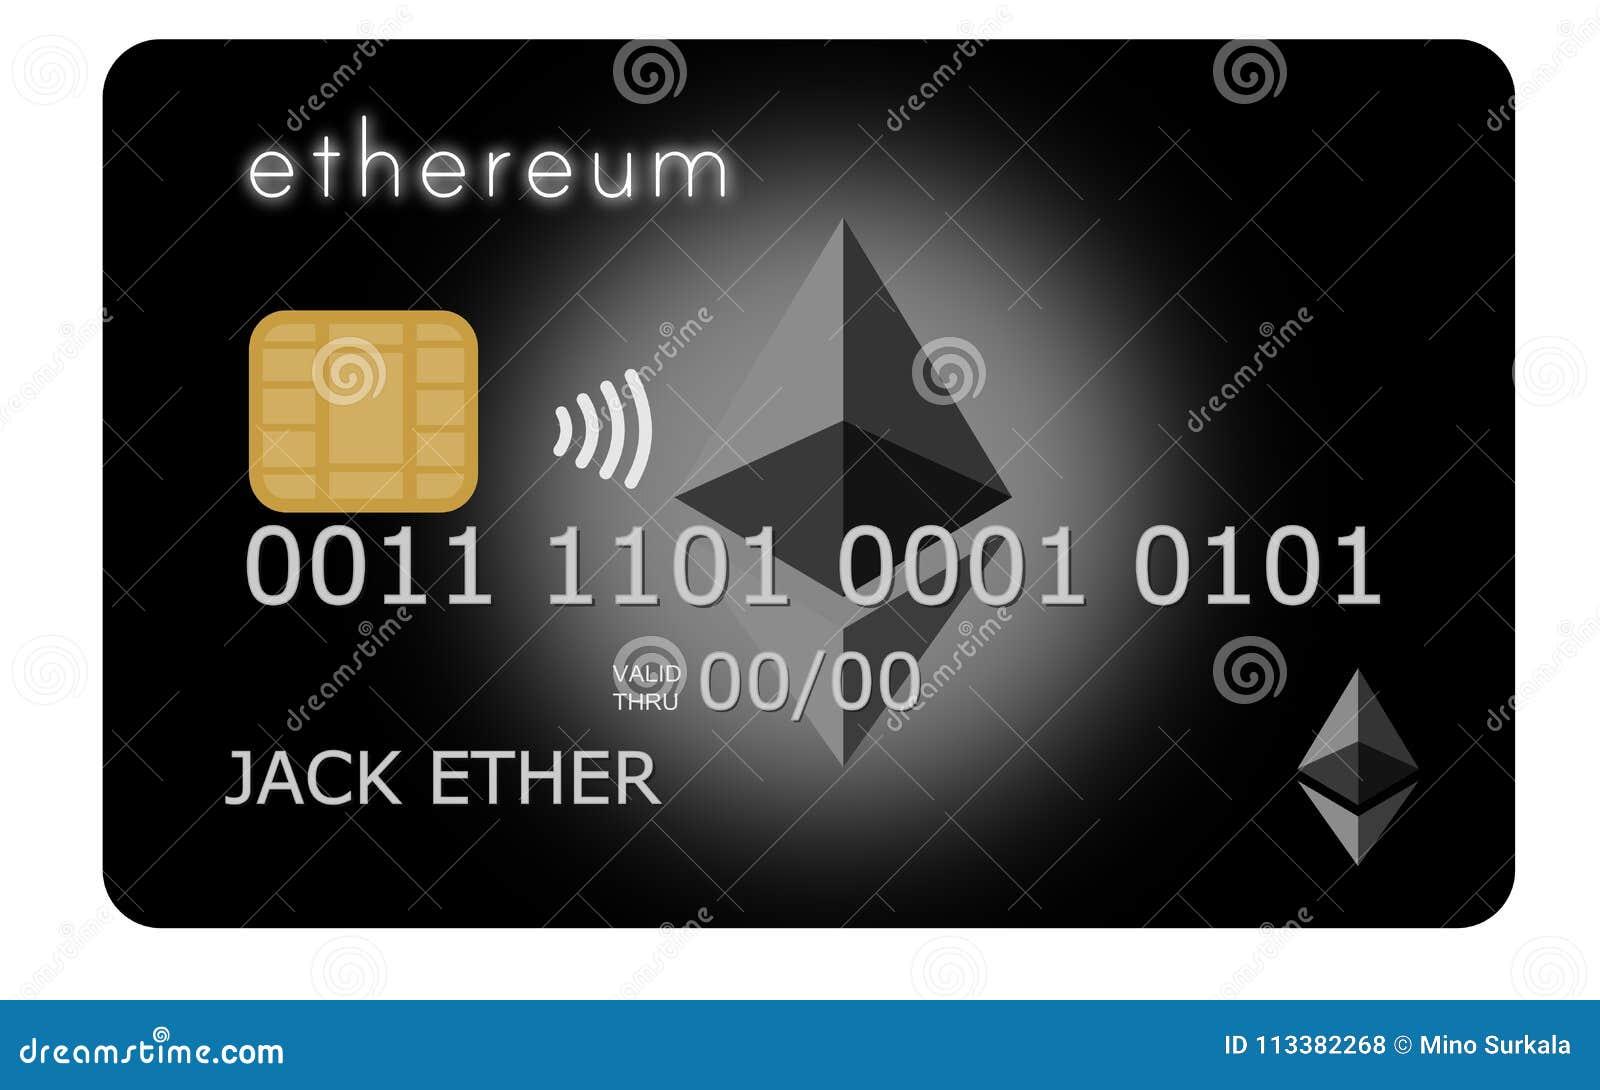 ethereum debit card